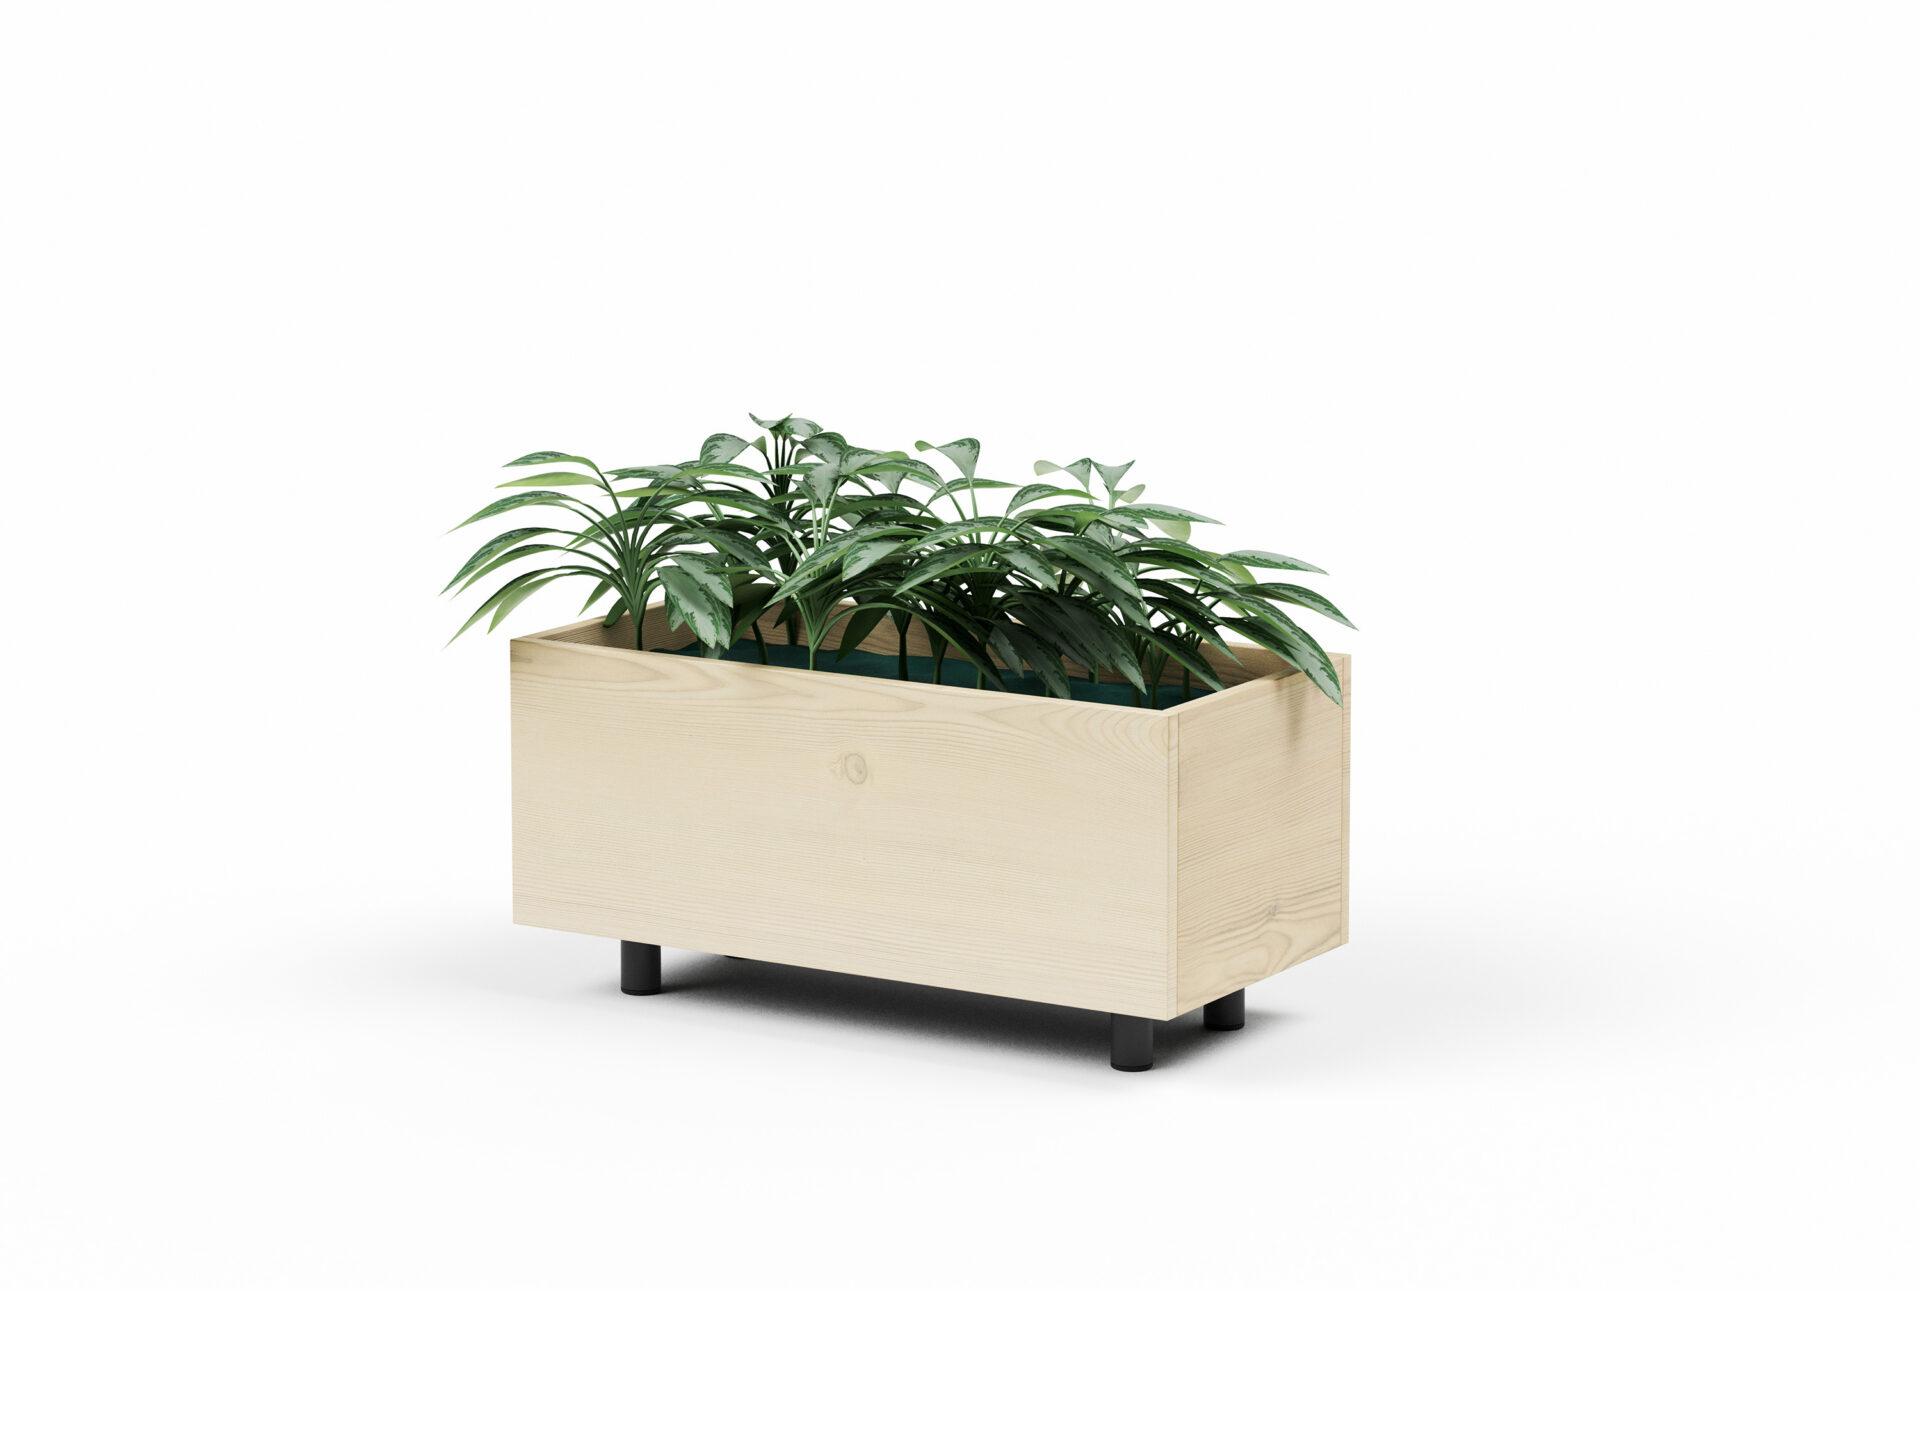 Planter small